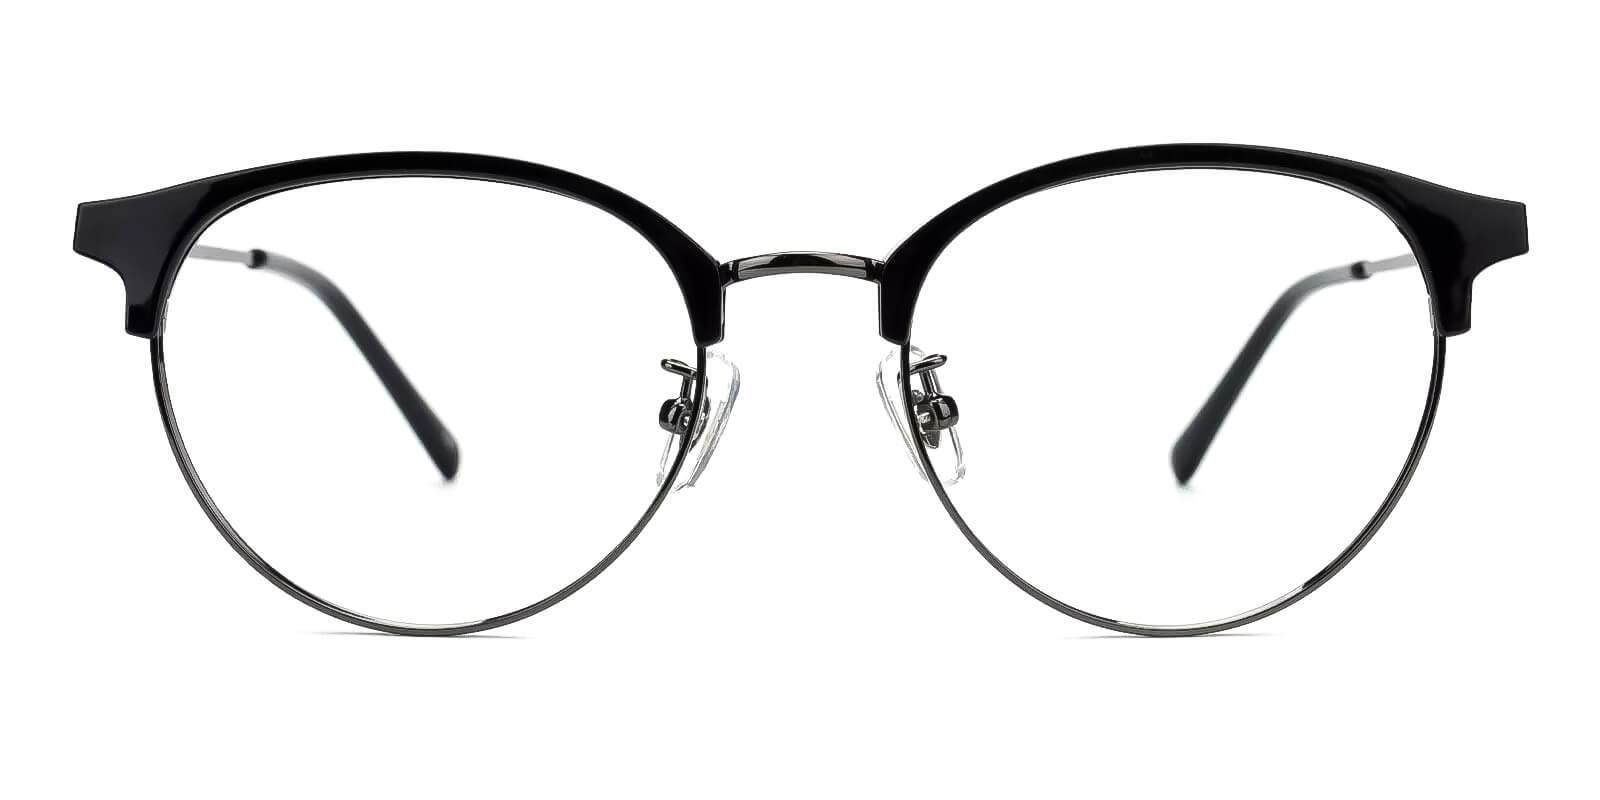 Similar Black Metal Eyeglasses , Fashion , NosePads Frames from ABBE Glasses